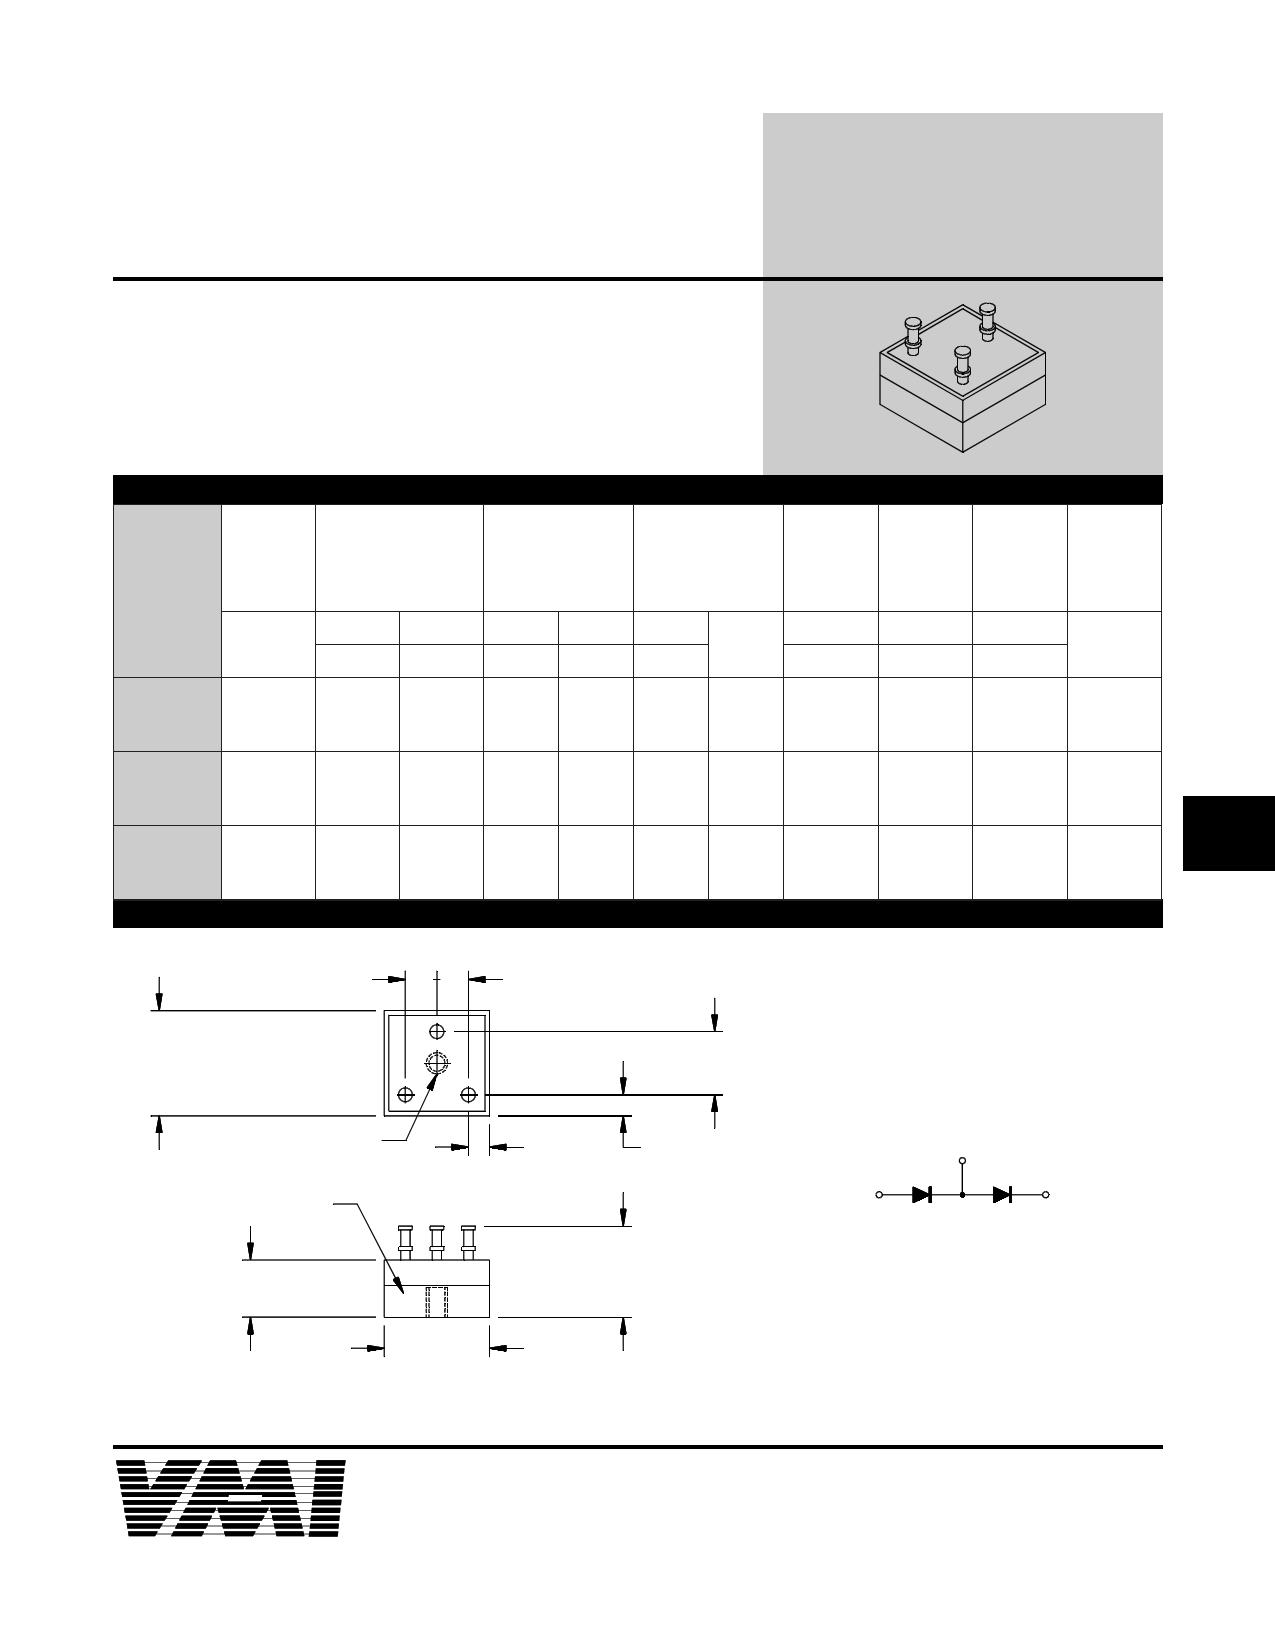 LTI210D دیتاشیت PDF